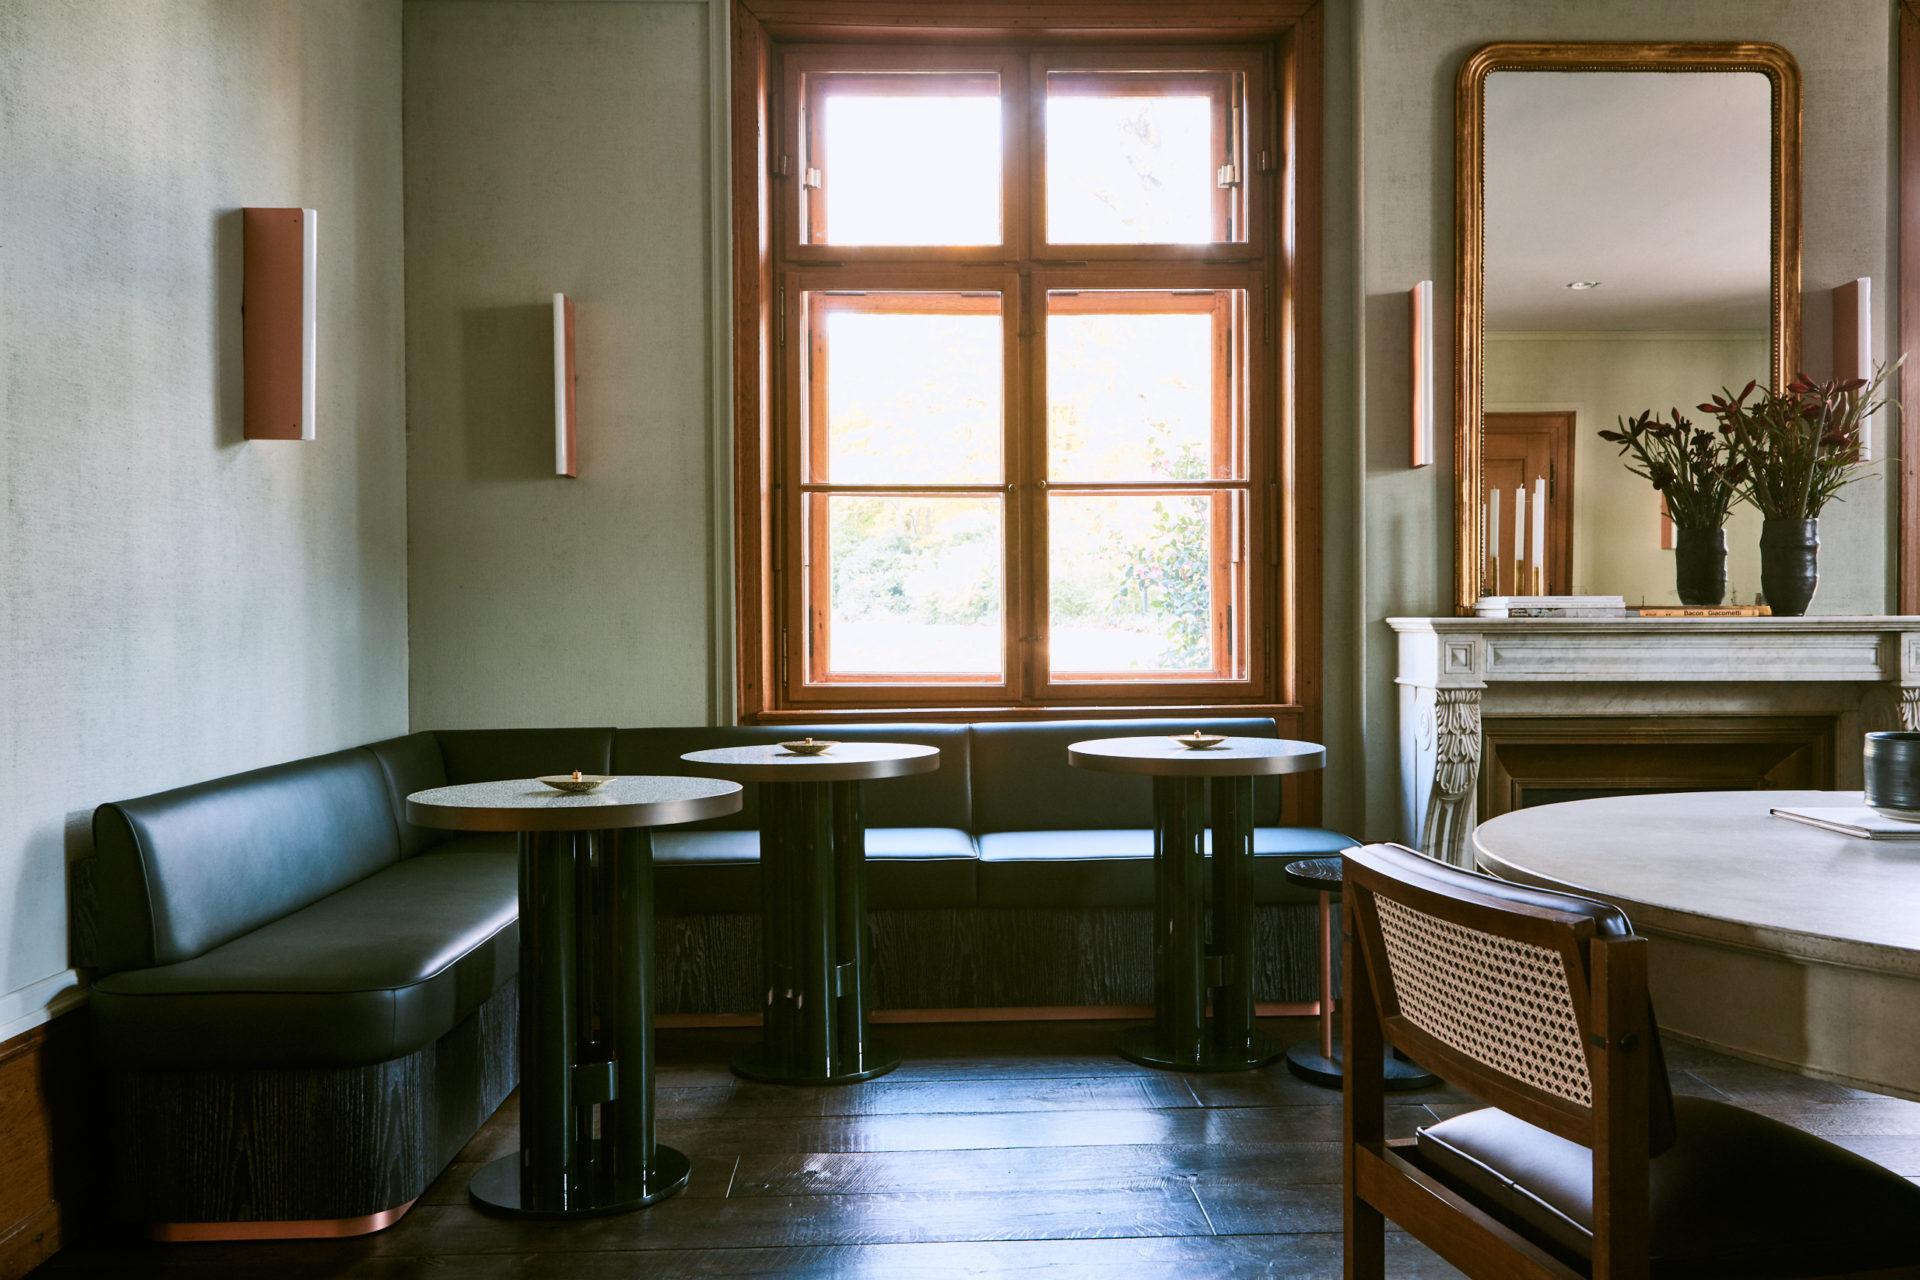 At Fondation Beyeler. — Casa Muñoz casa muÑoz CASA MUÑOZ: A LUXURIOUS INTERIOR STUDIO FROM MADRID GM HOLA EUGENIE044 1920x1280